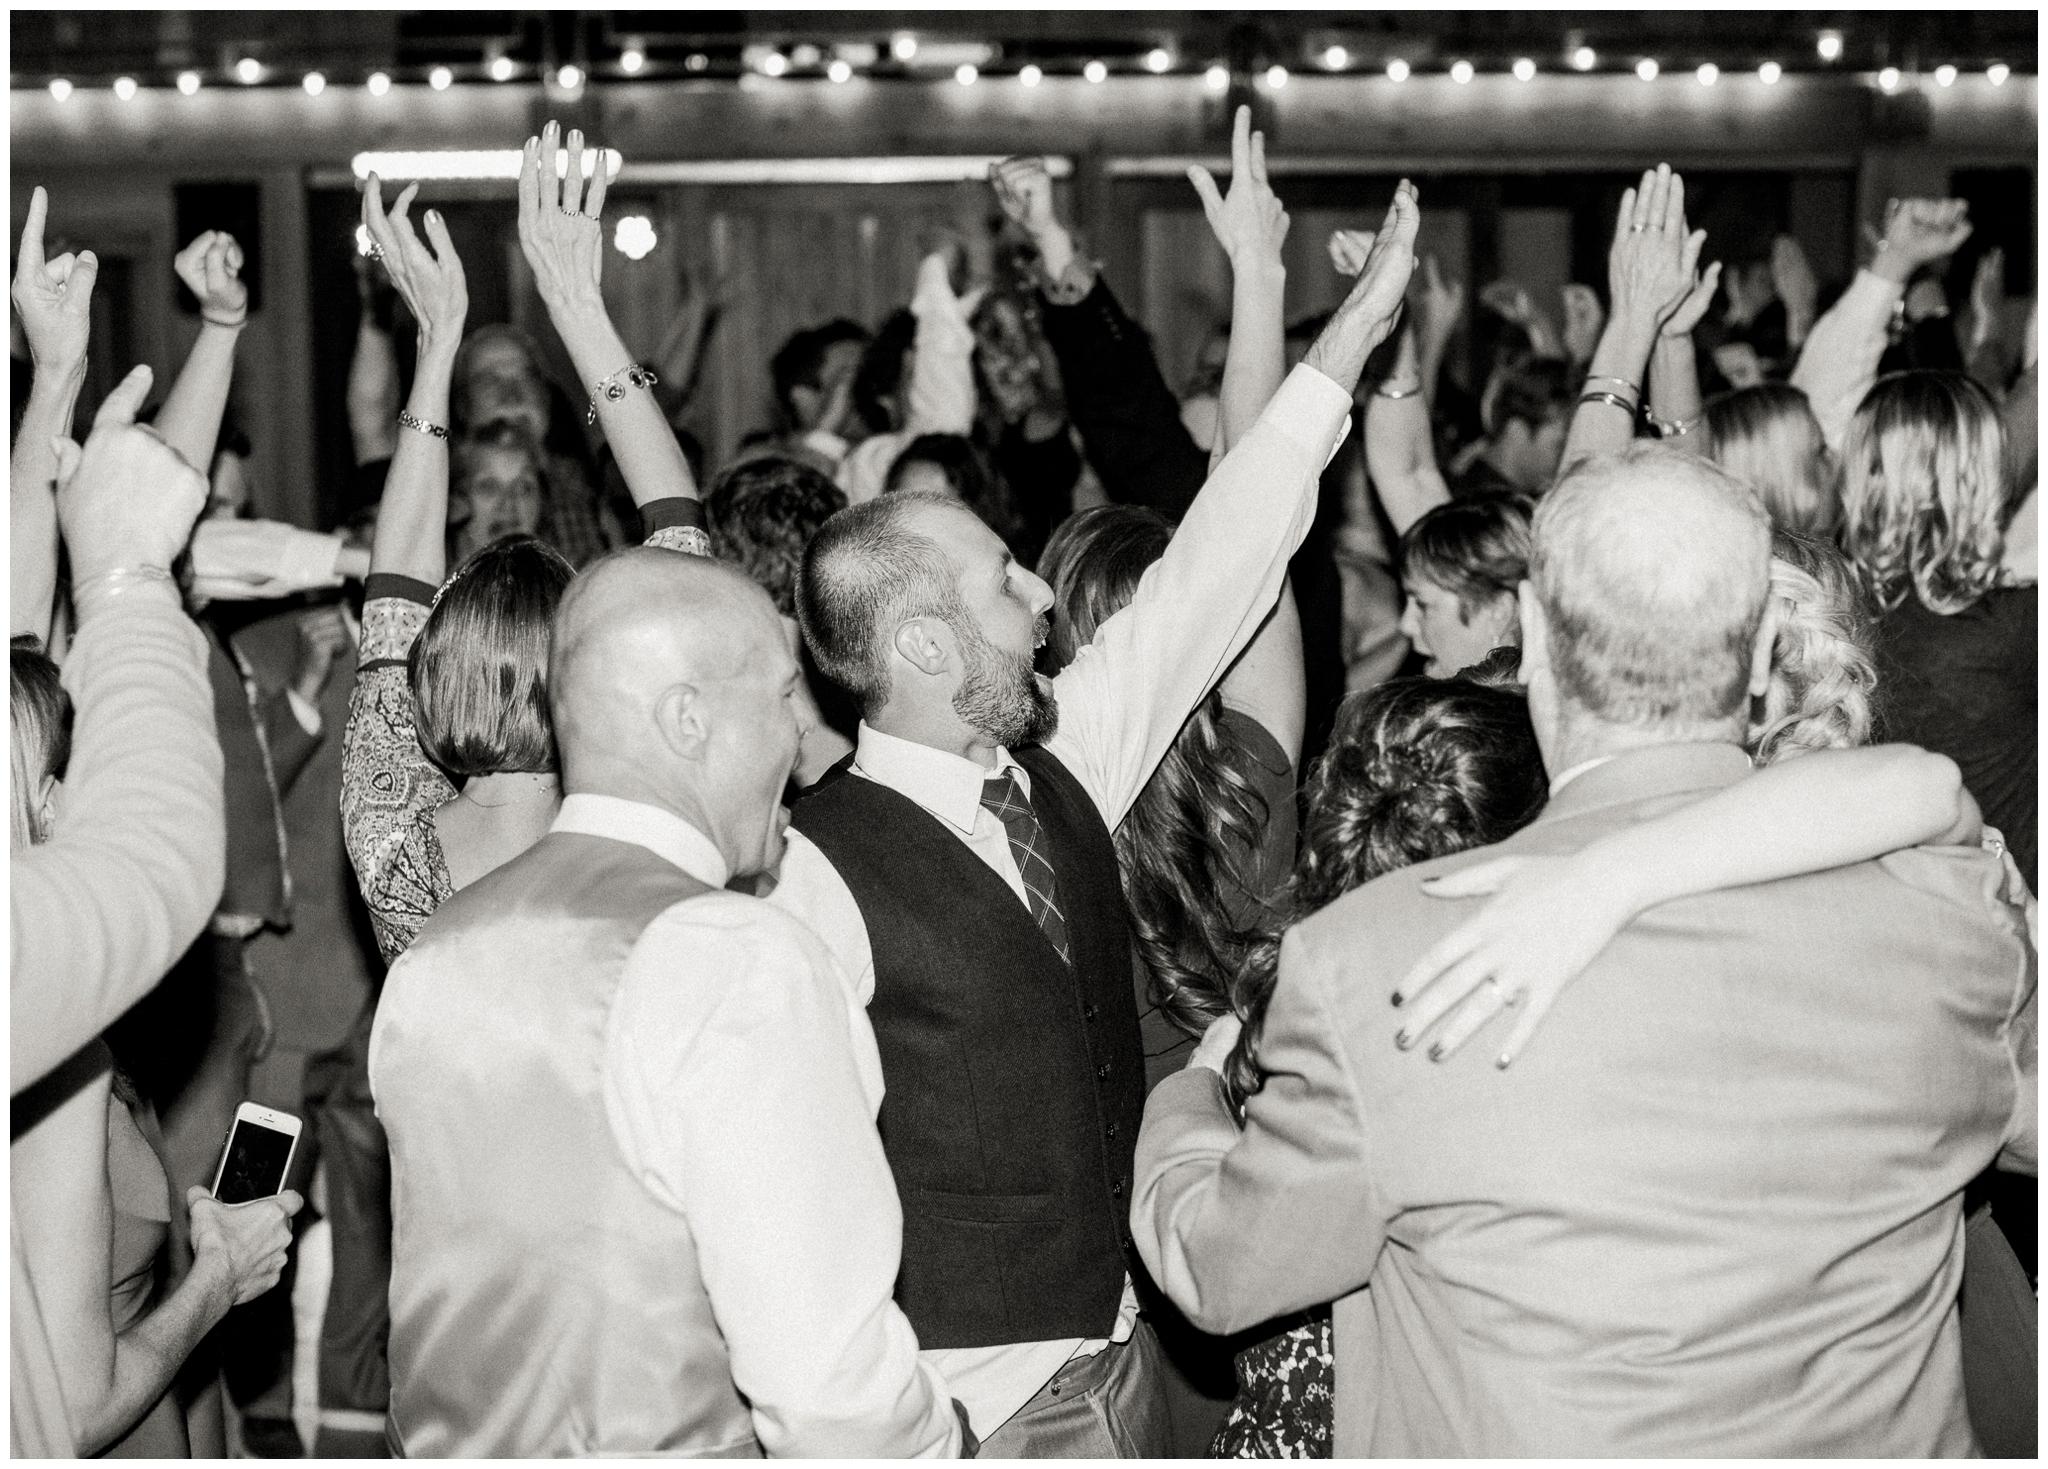 grizzly peak winery wedding